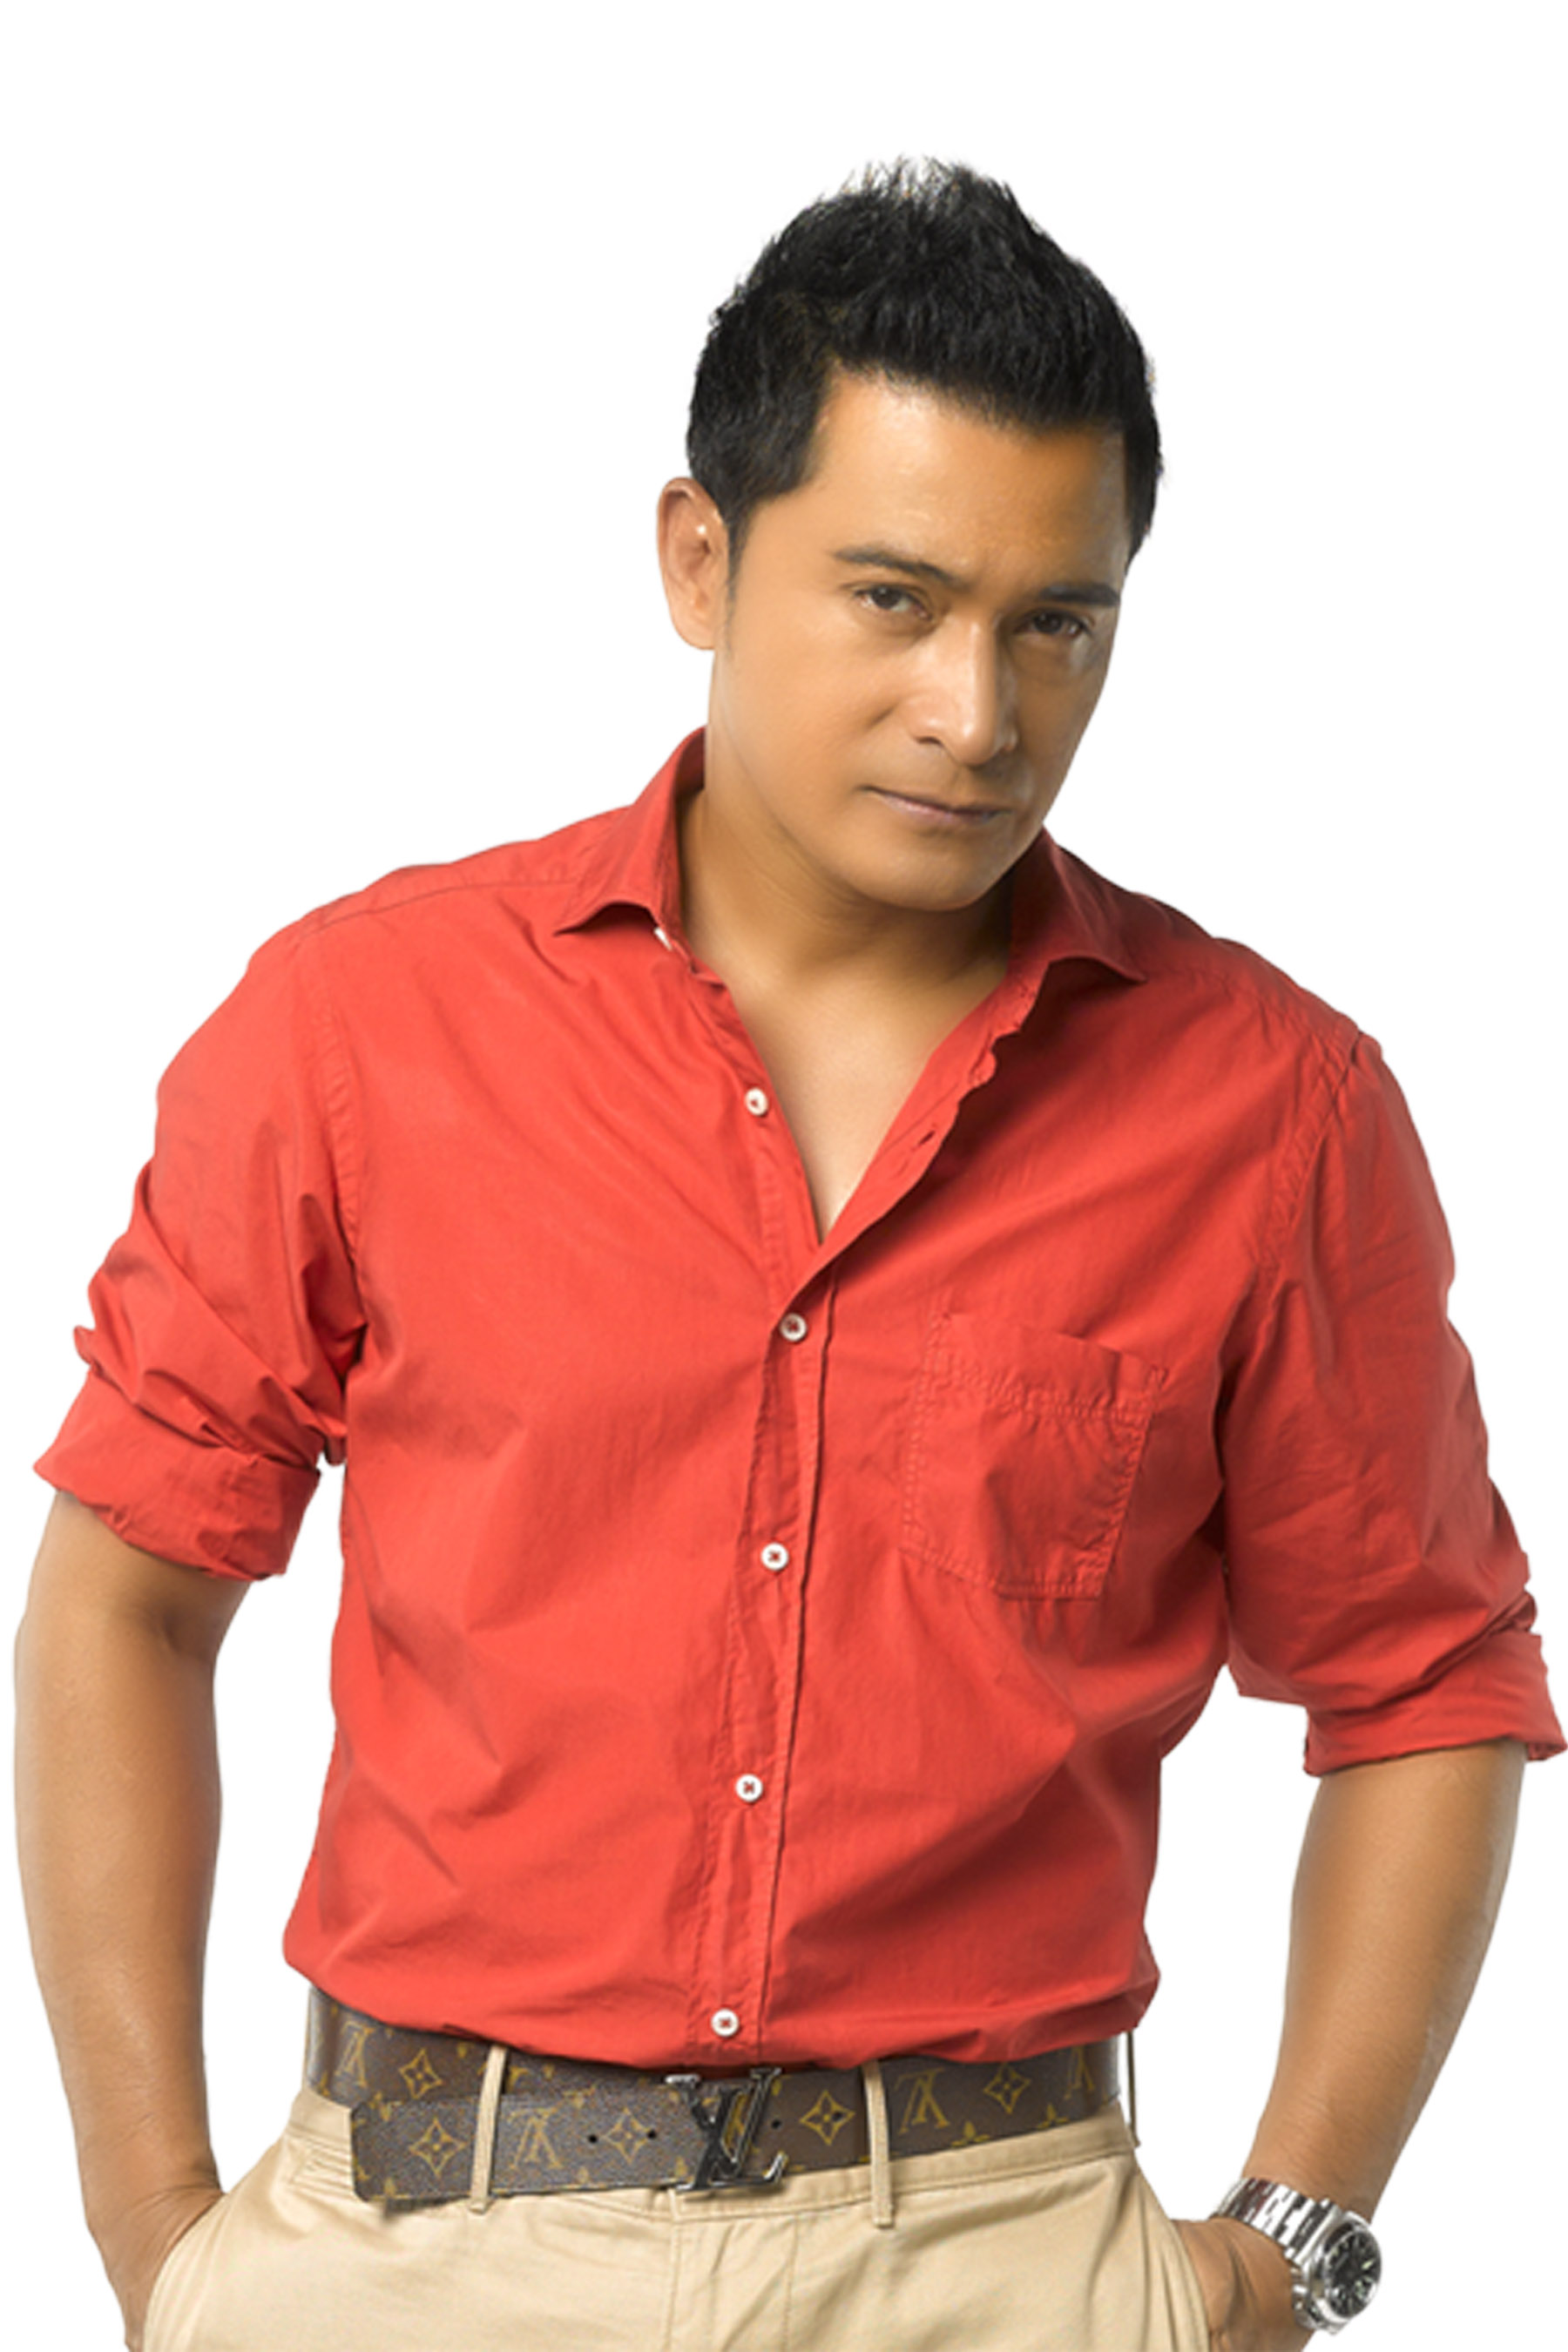 Actor Cesar Montano - age: 54